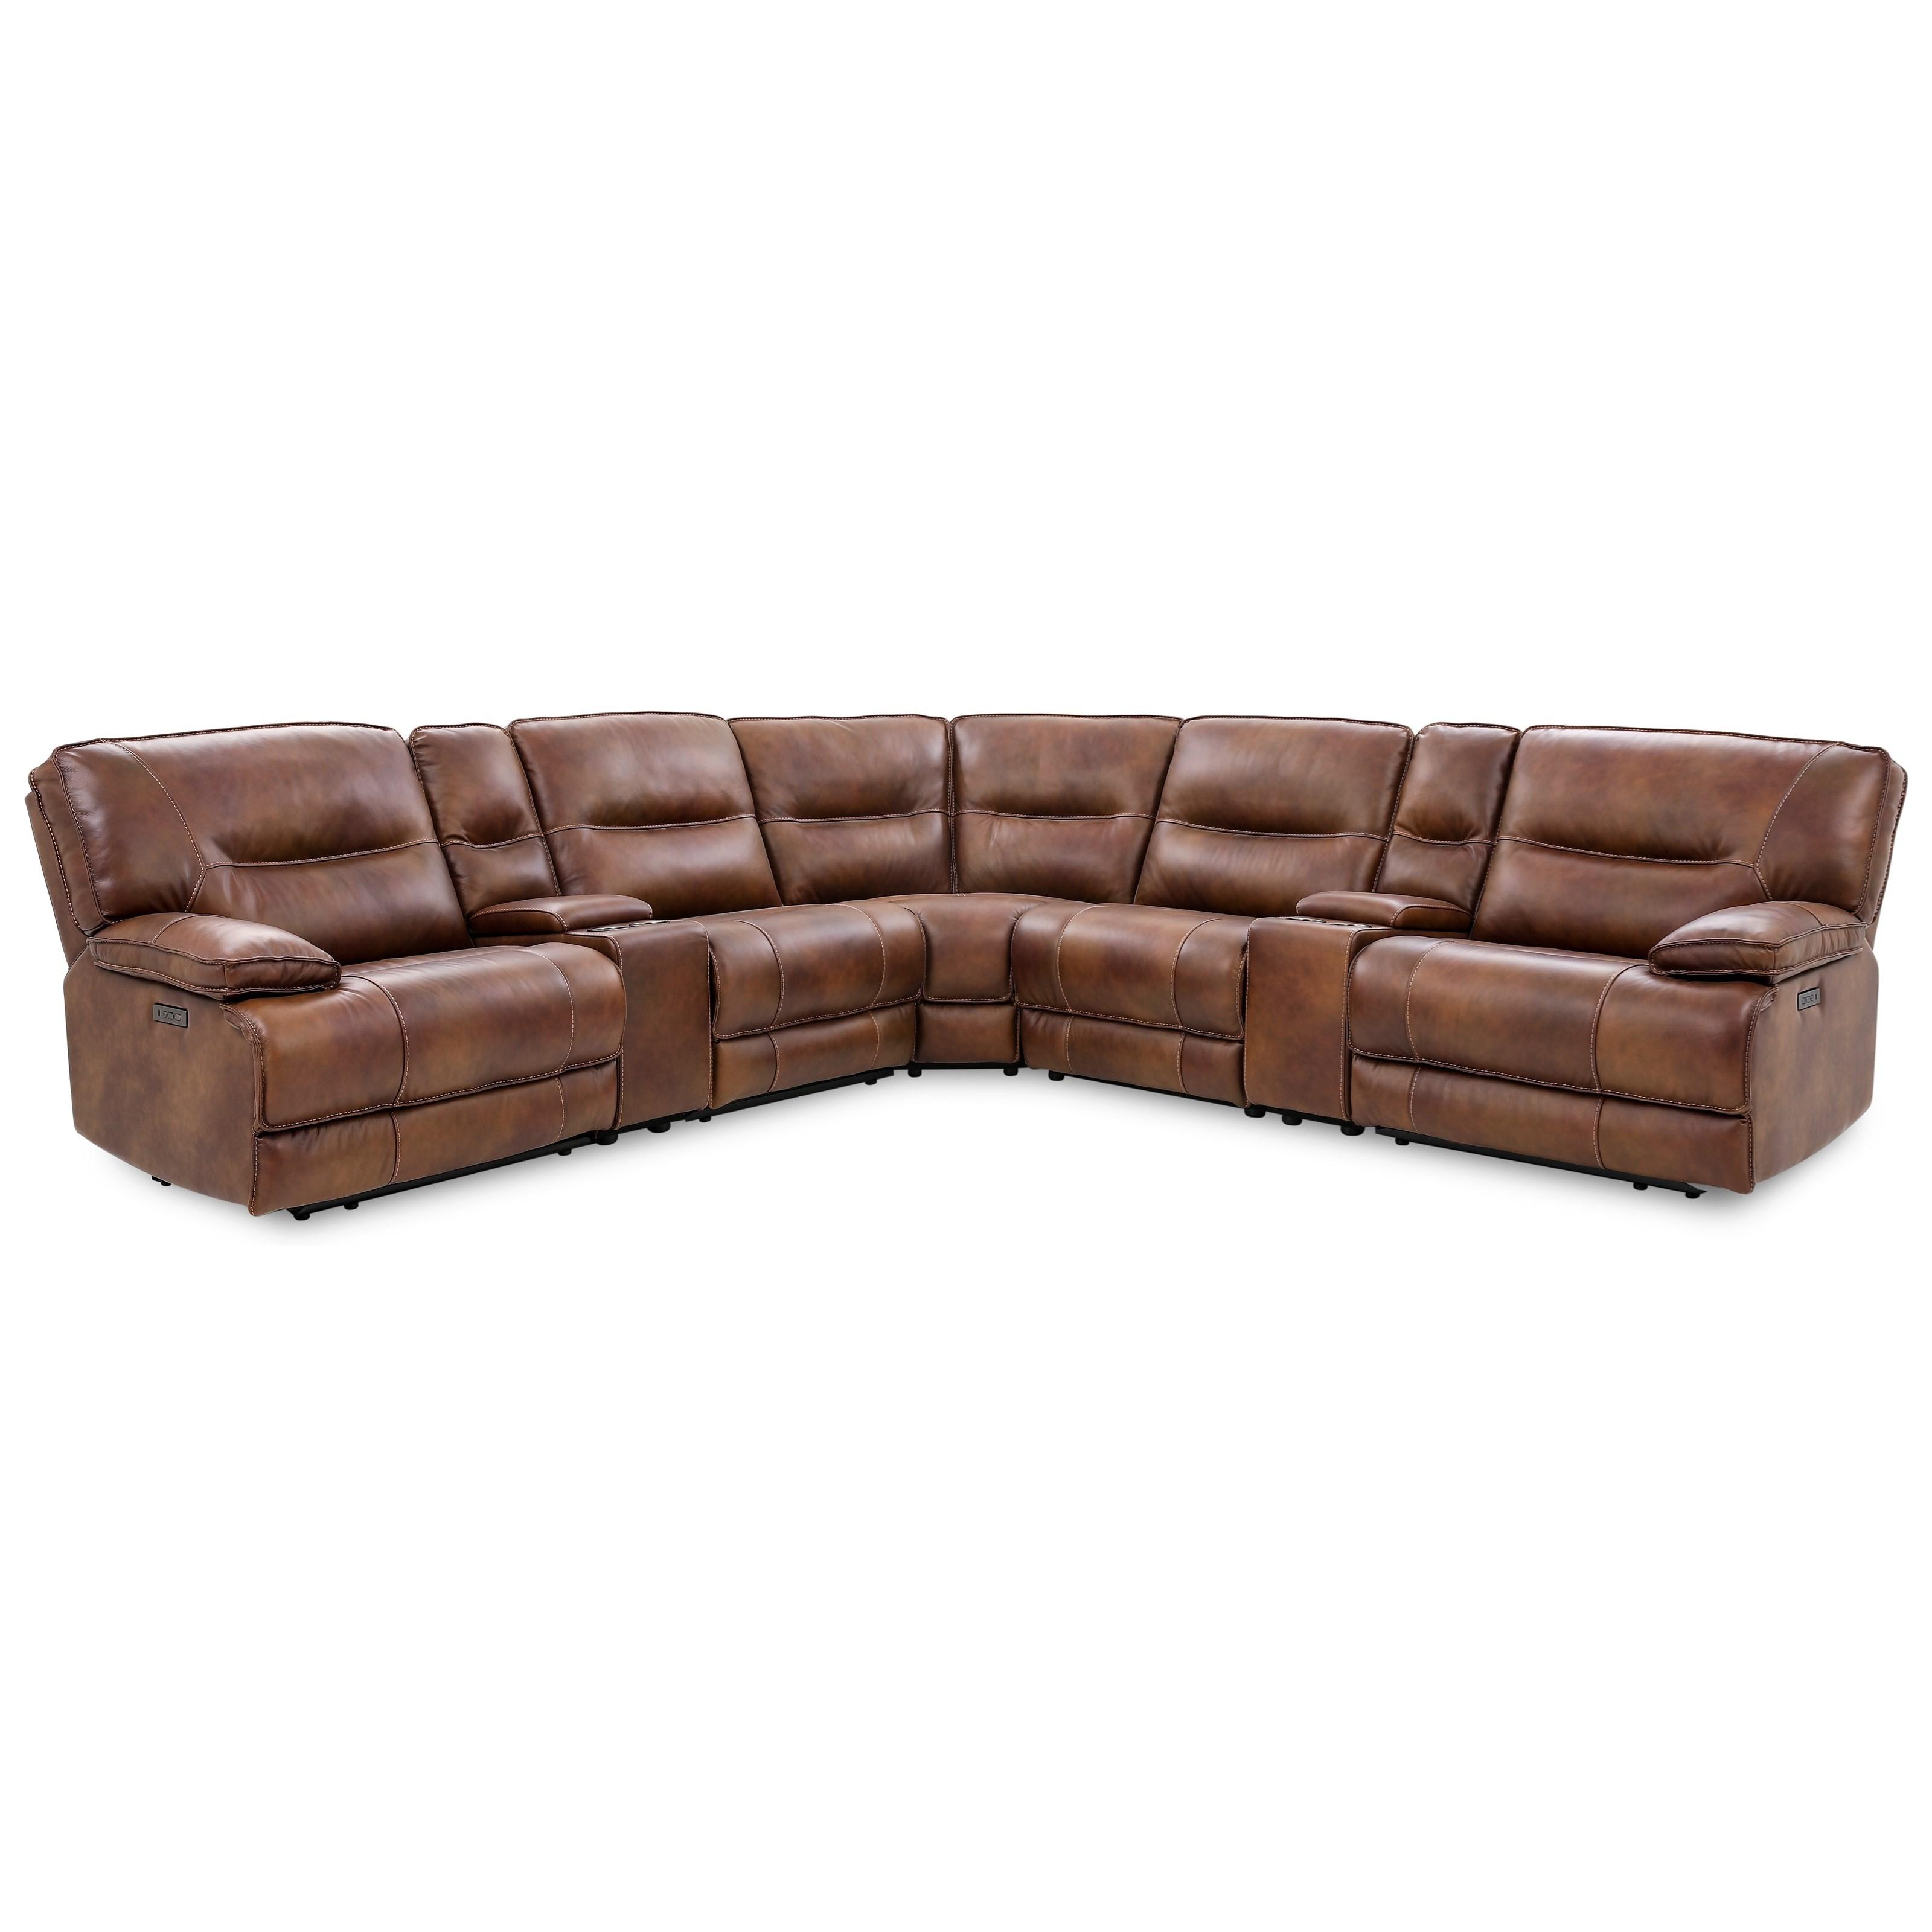 70048 6 piece power reclining sectional